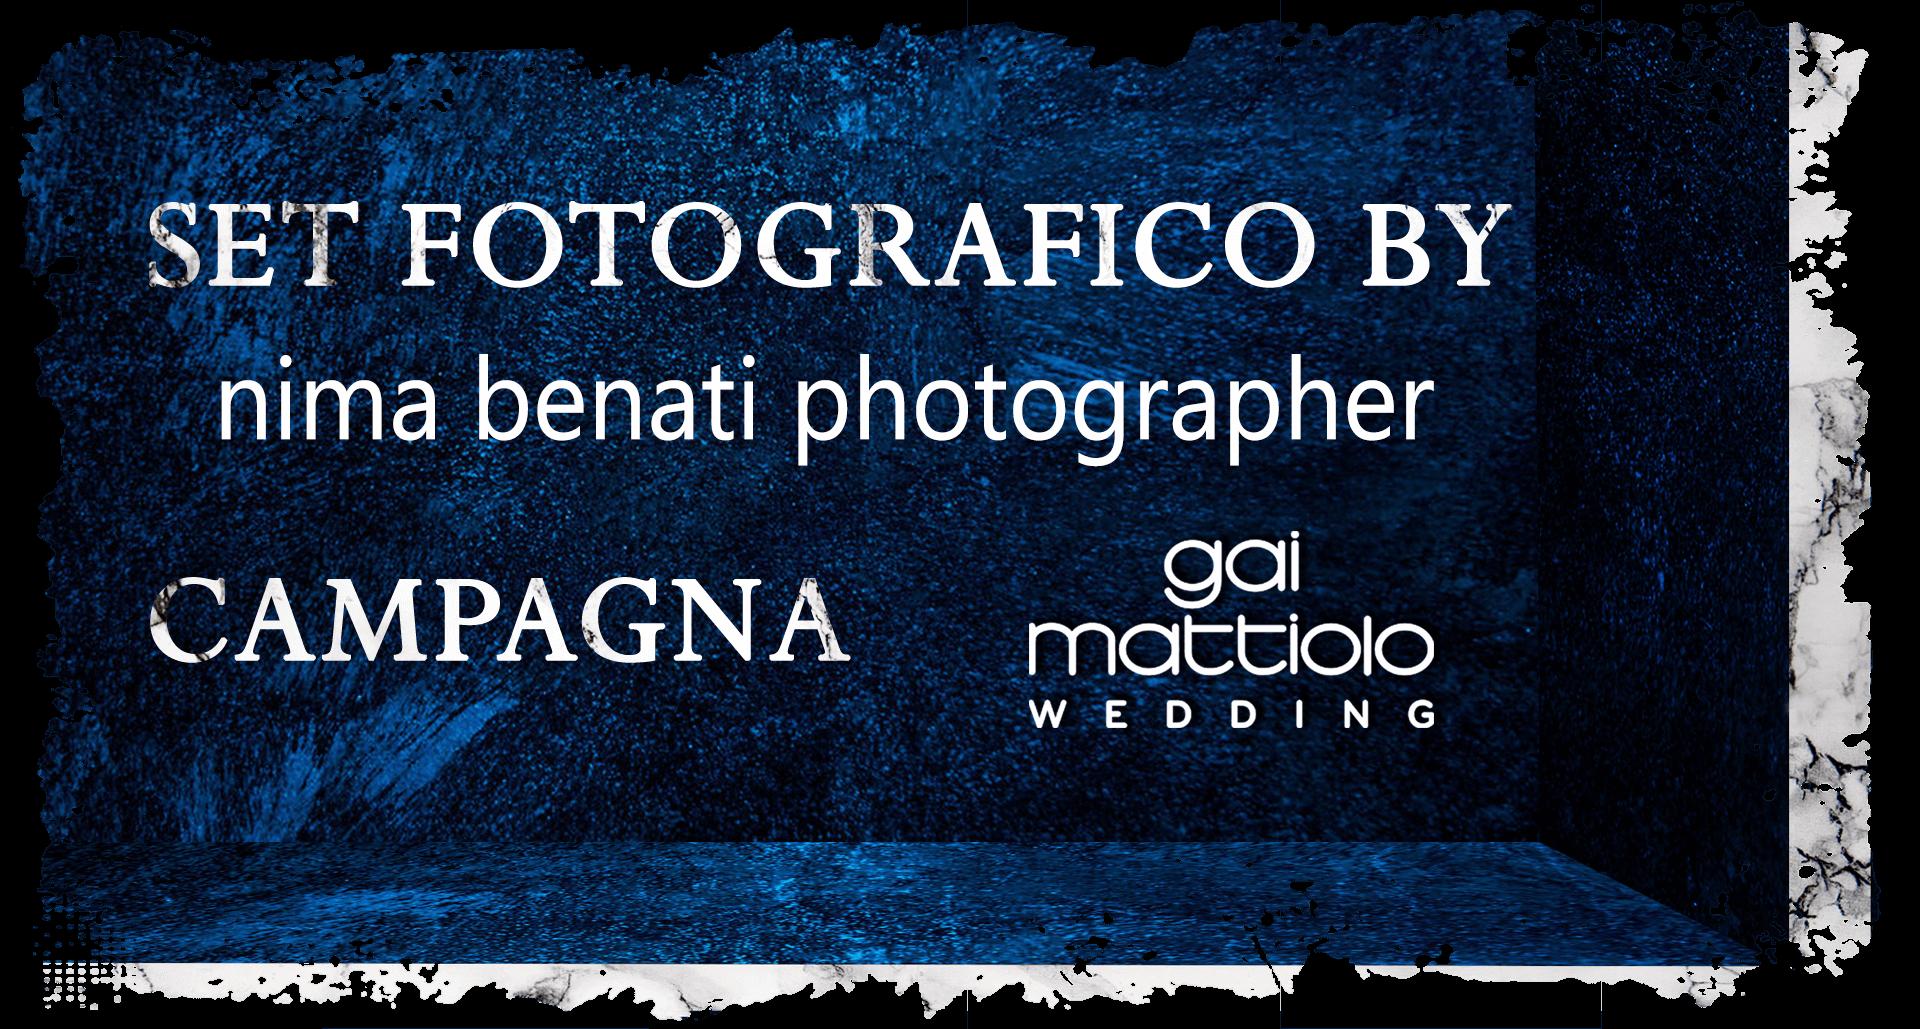 Set fotografico